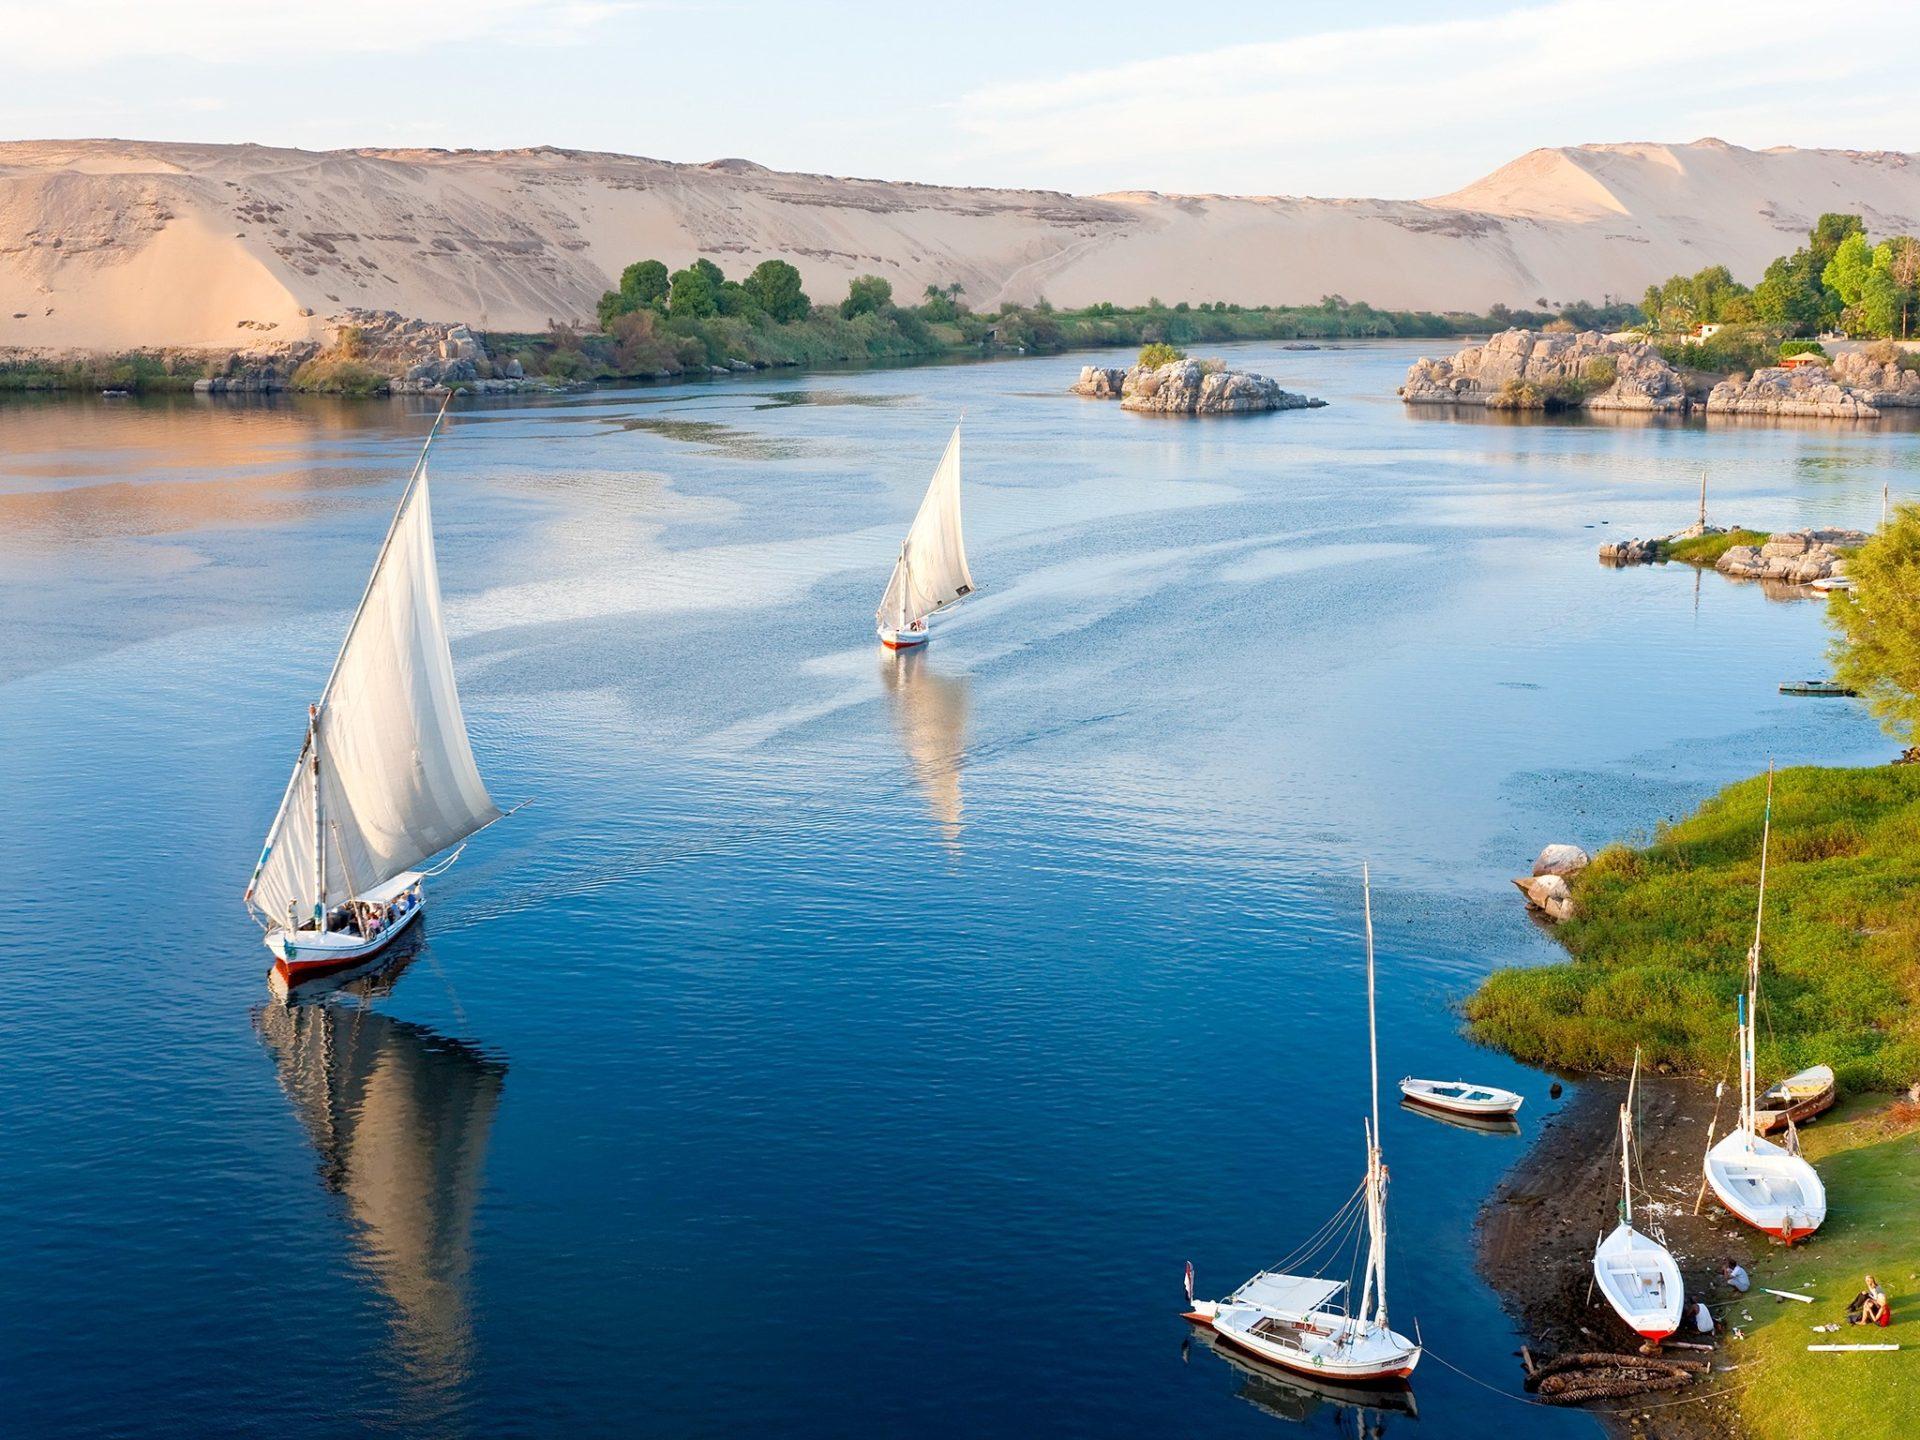 5. Река Нил, Асуан, Египет.